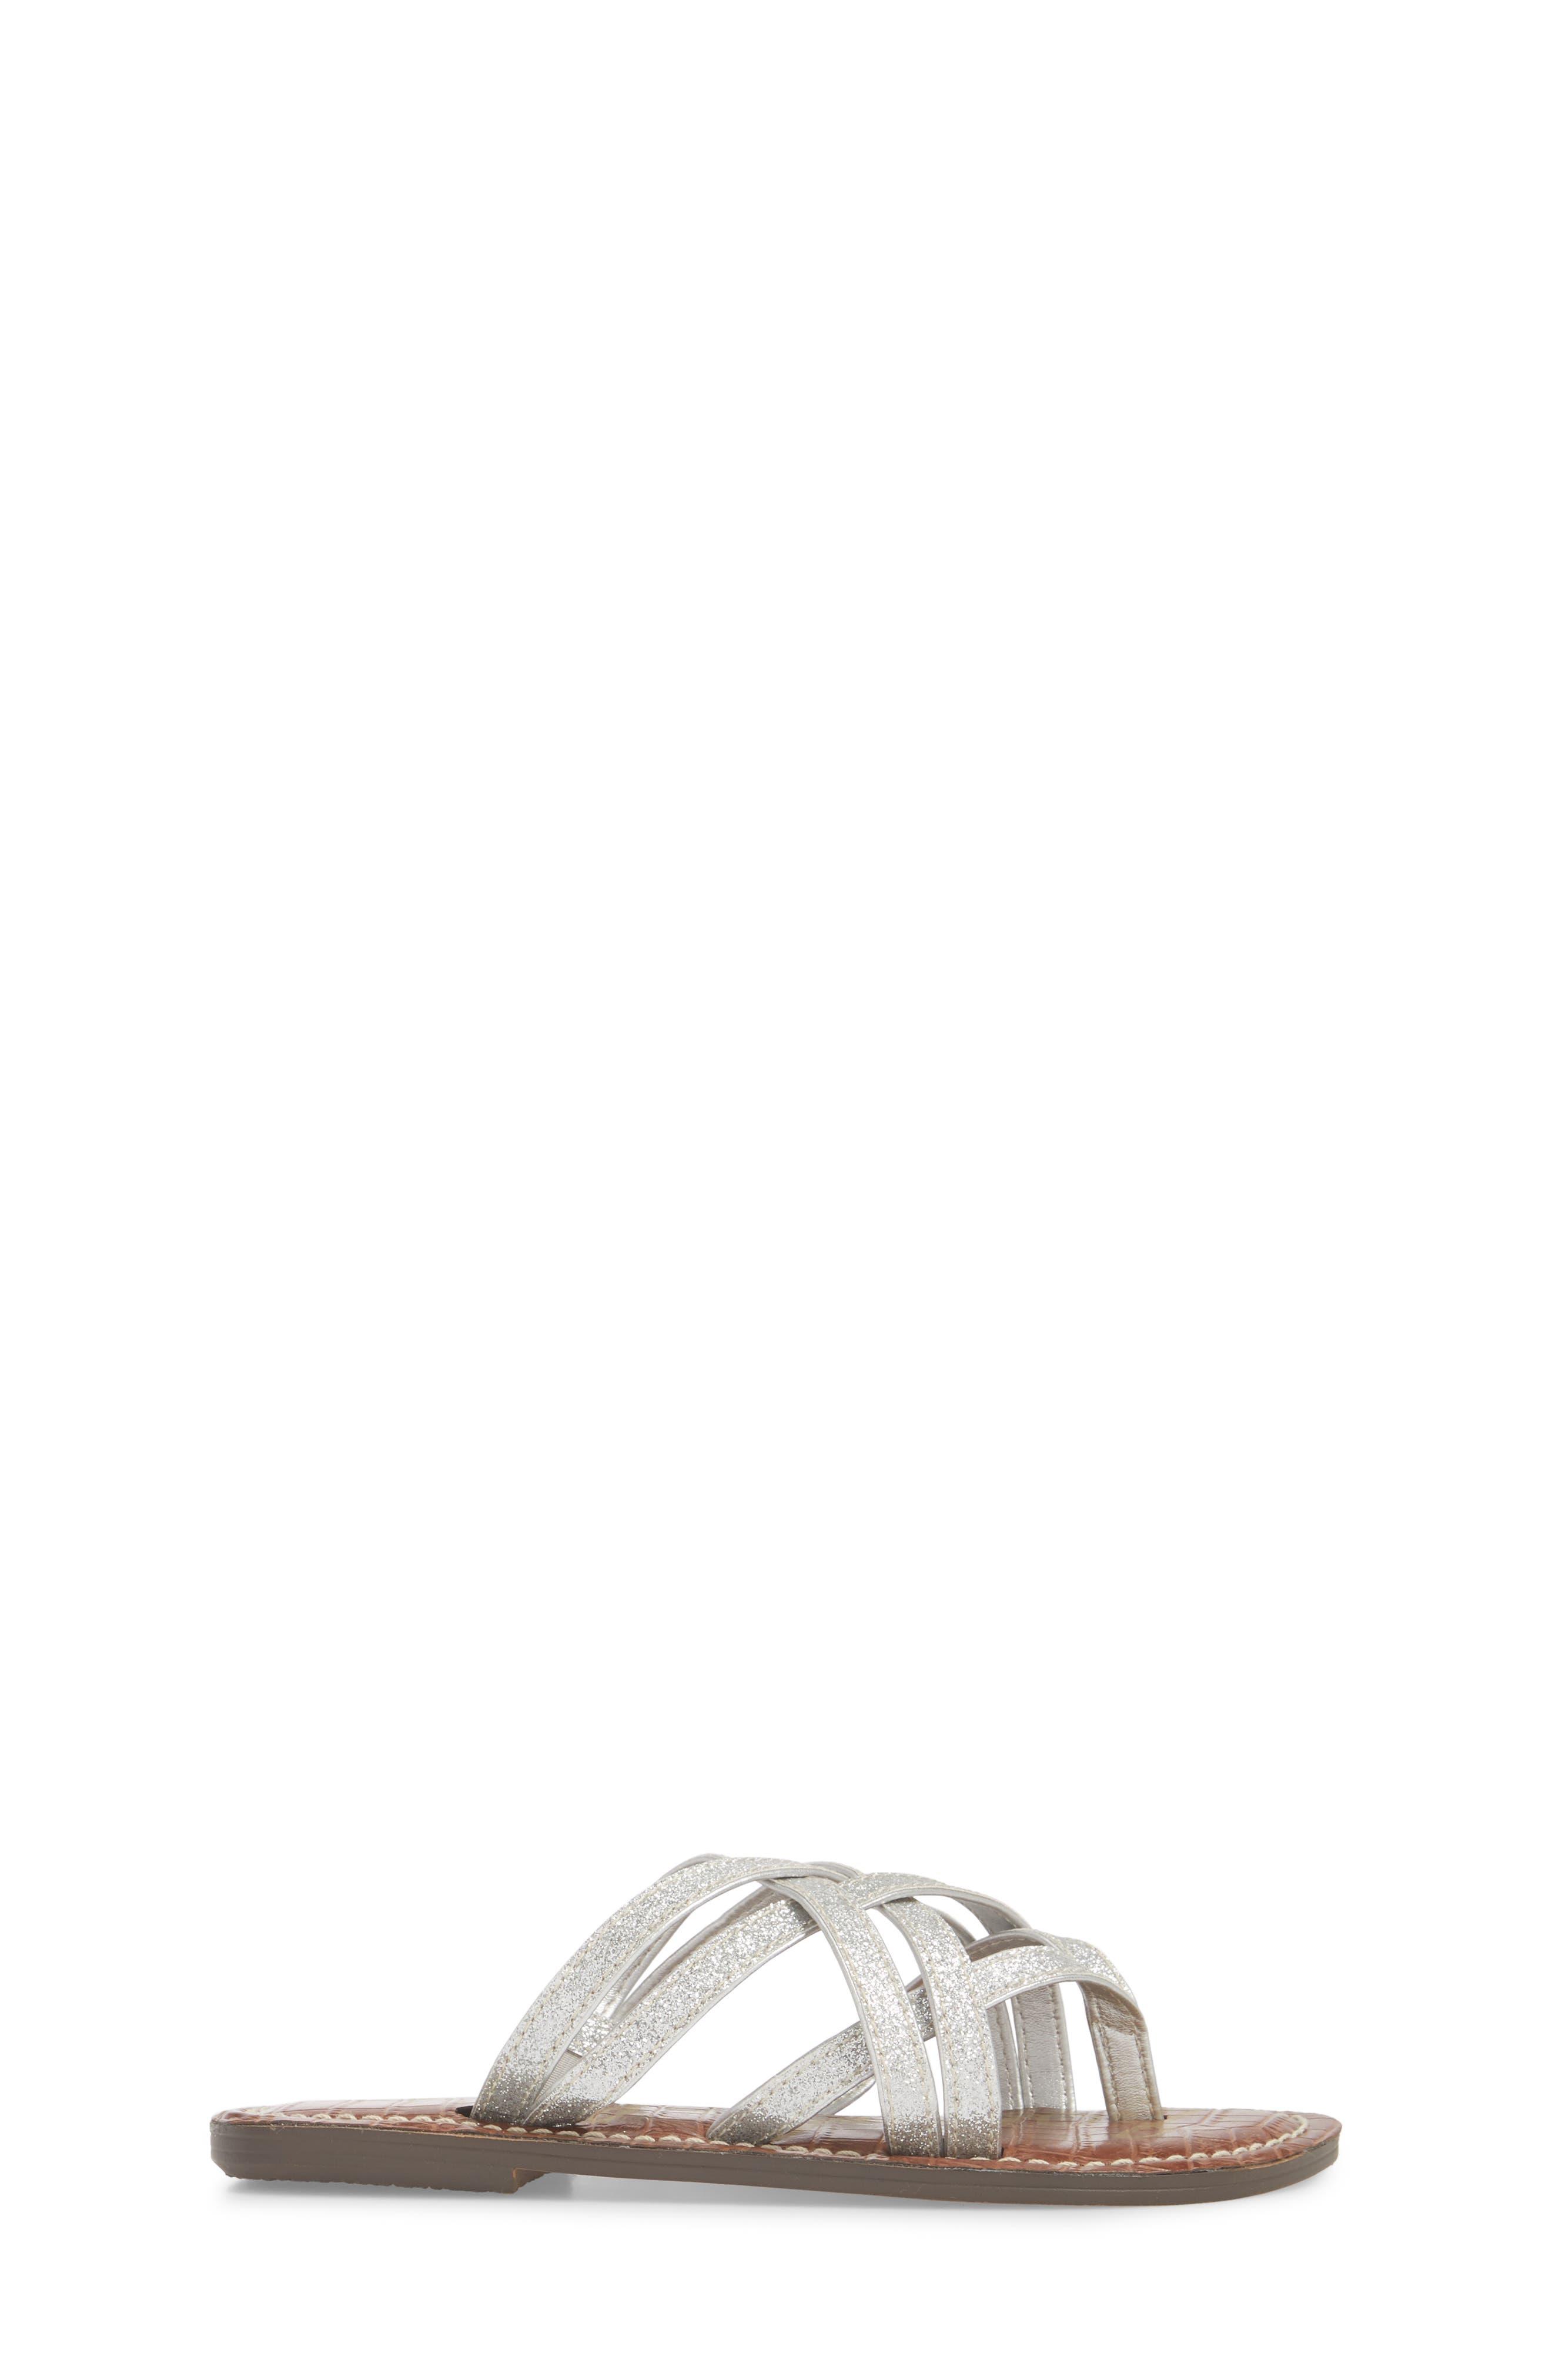 Georgette Glitter Flat Sandal,                             Alternate thumbnail 3, color,                             040